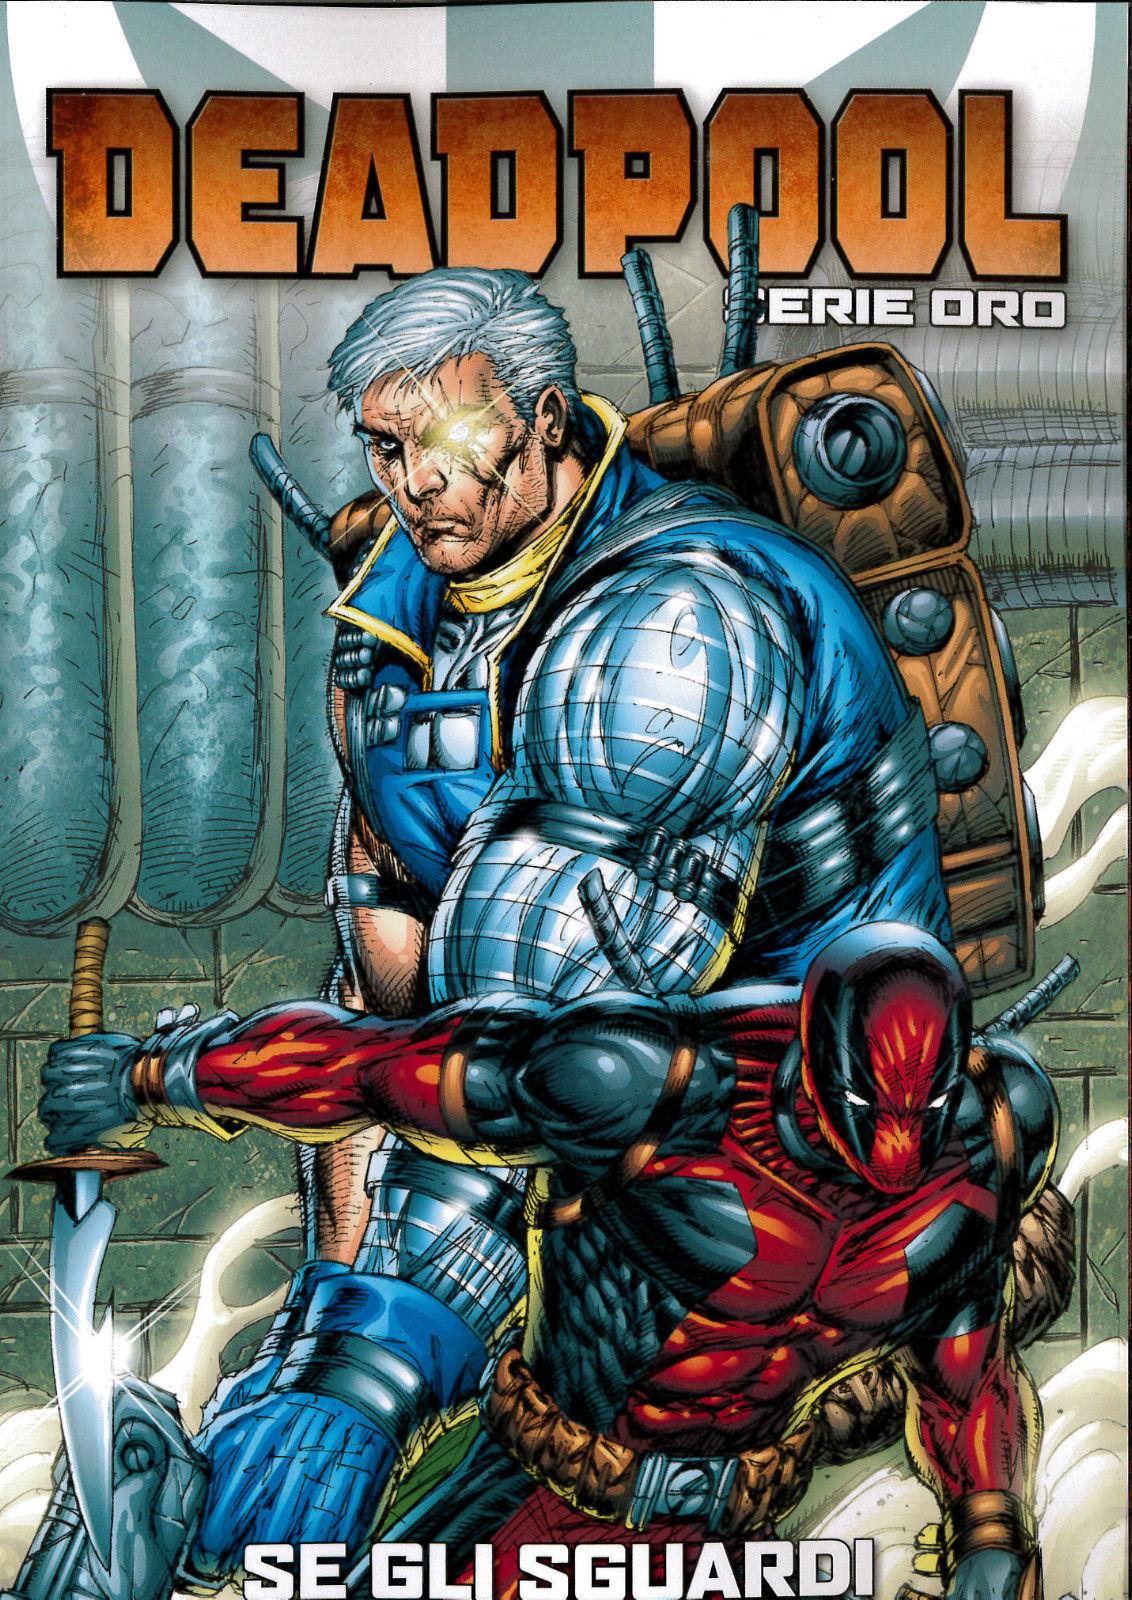 Deadpool: Serie oro vol. 11